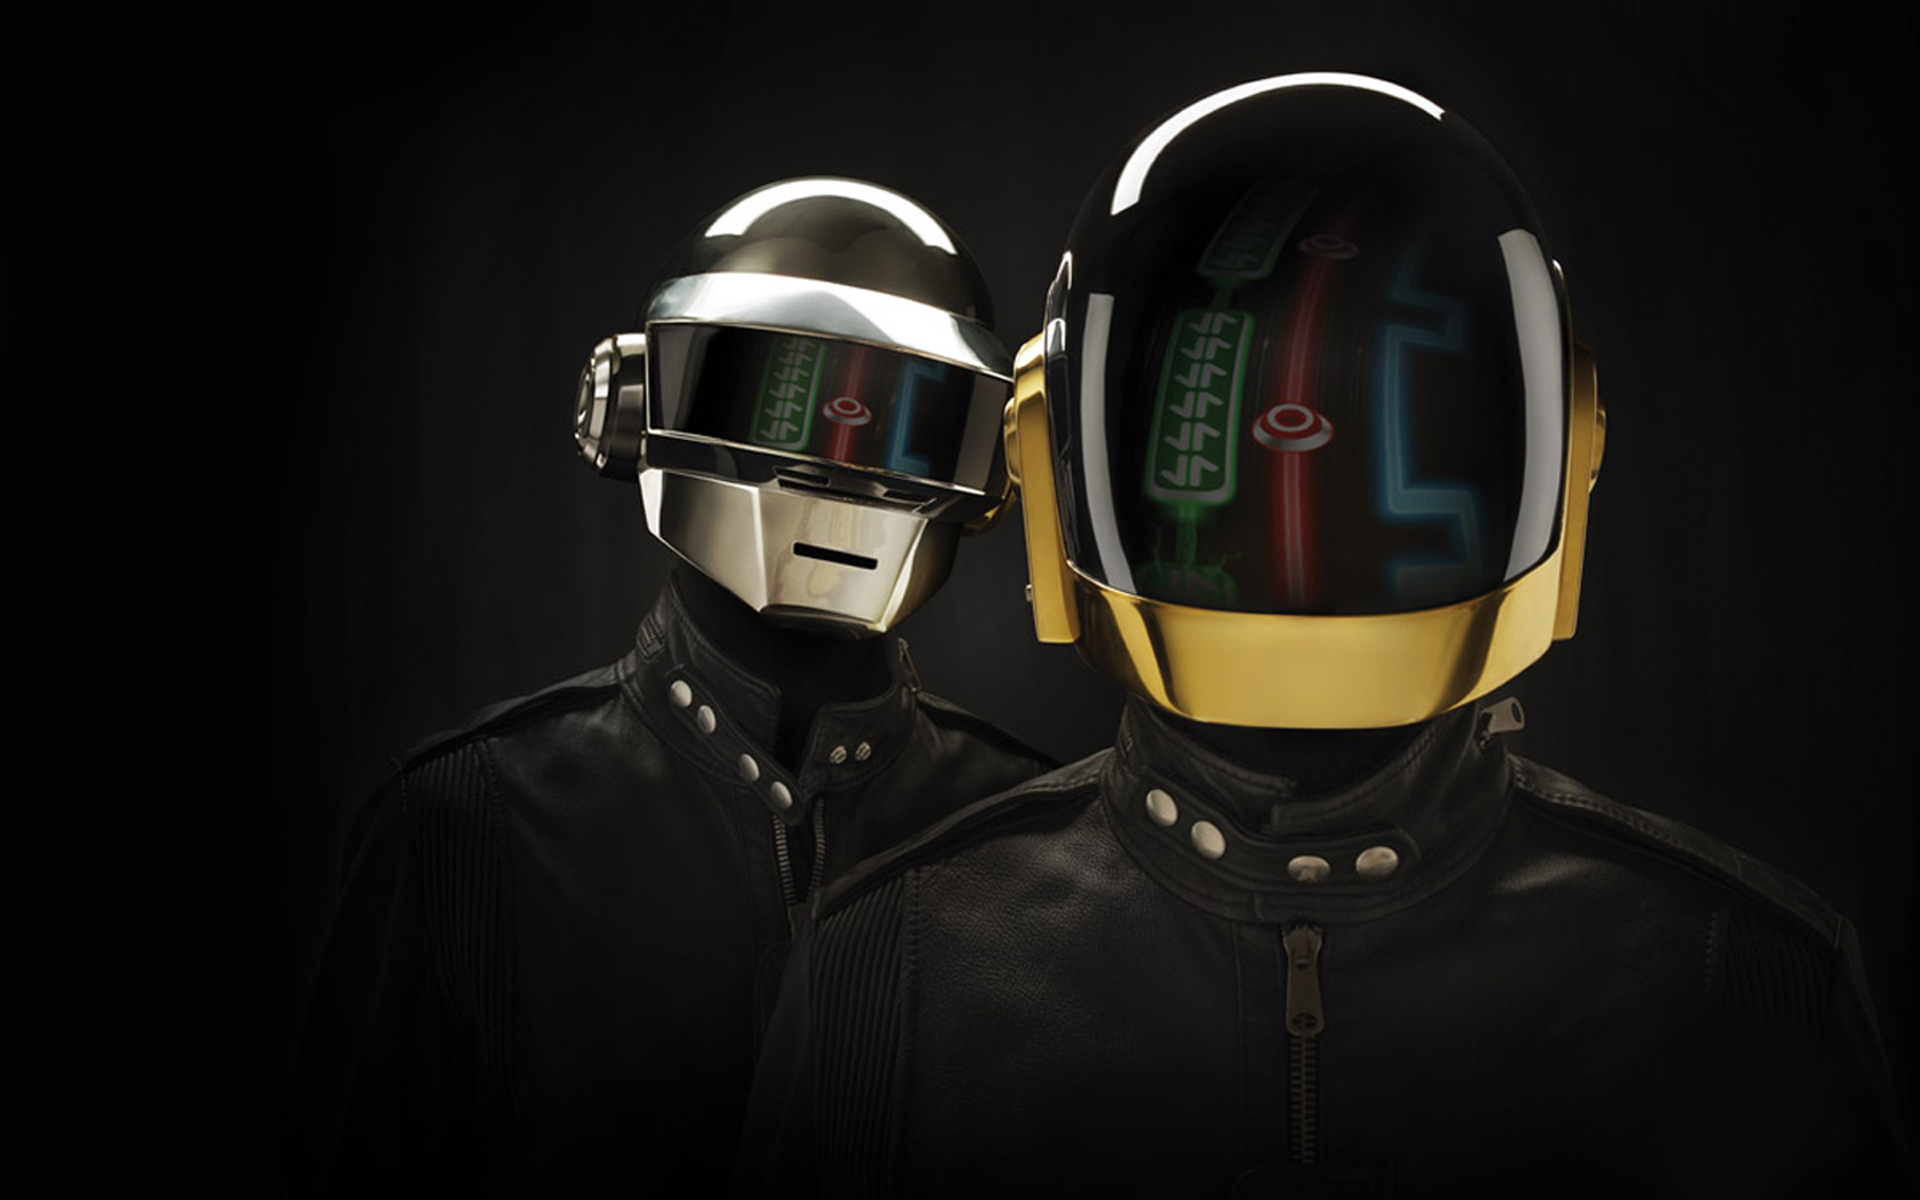 Daft Punk | Daft punk, Daft punk helmet, Daft punk poster